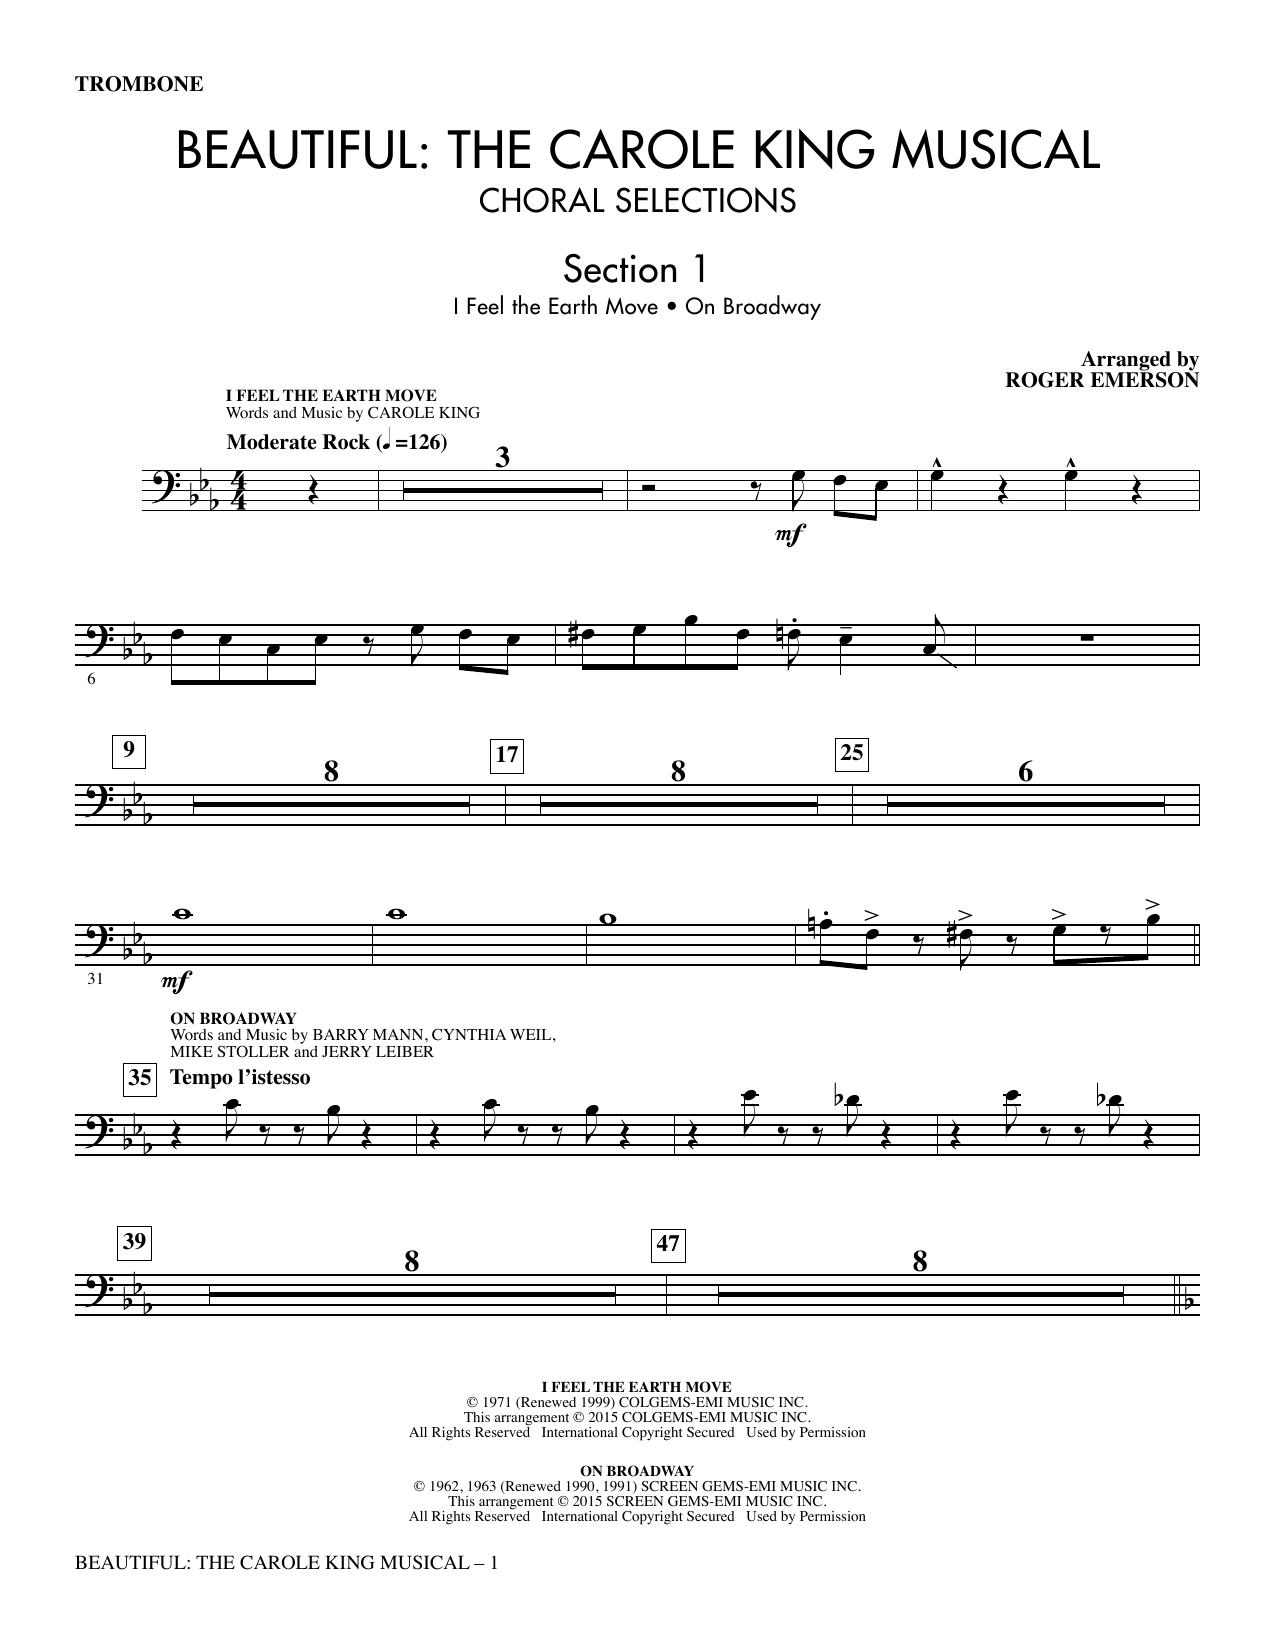 Beautiful: The Carole King Musical (Choral Selections) - Trombone sheet music